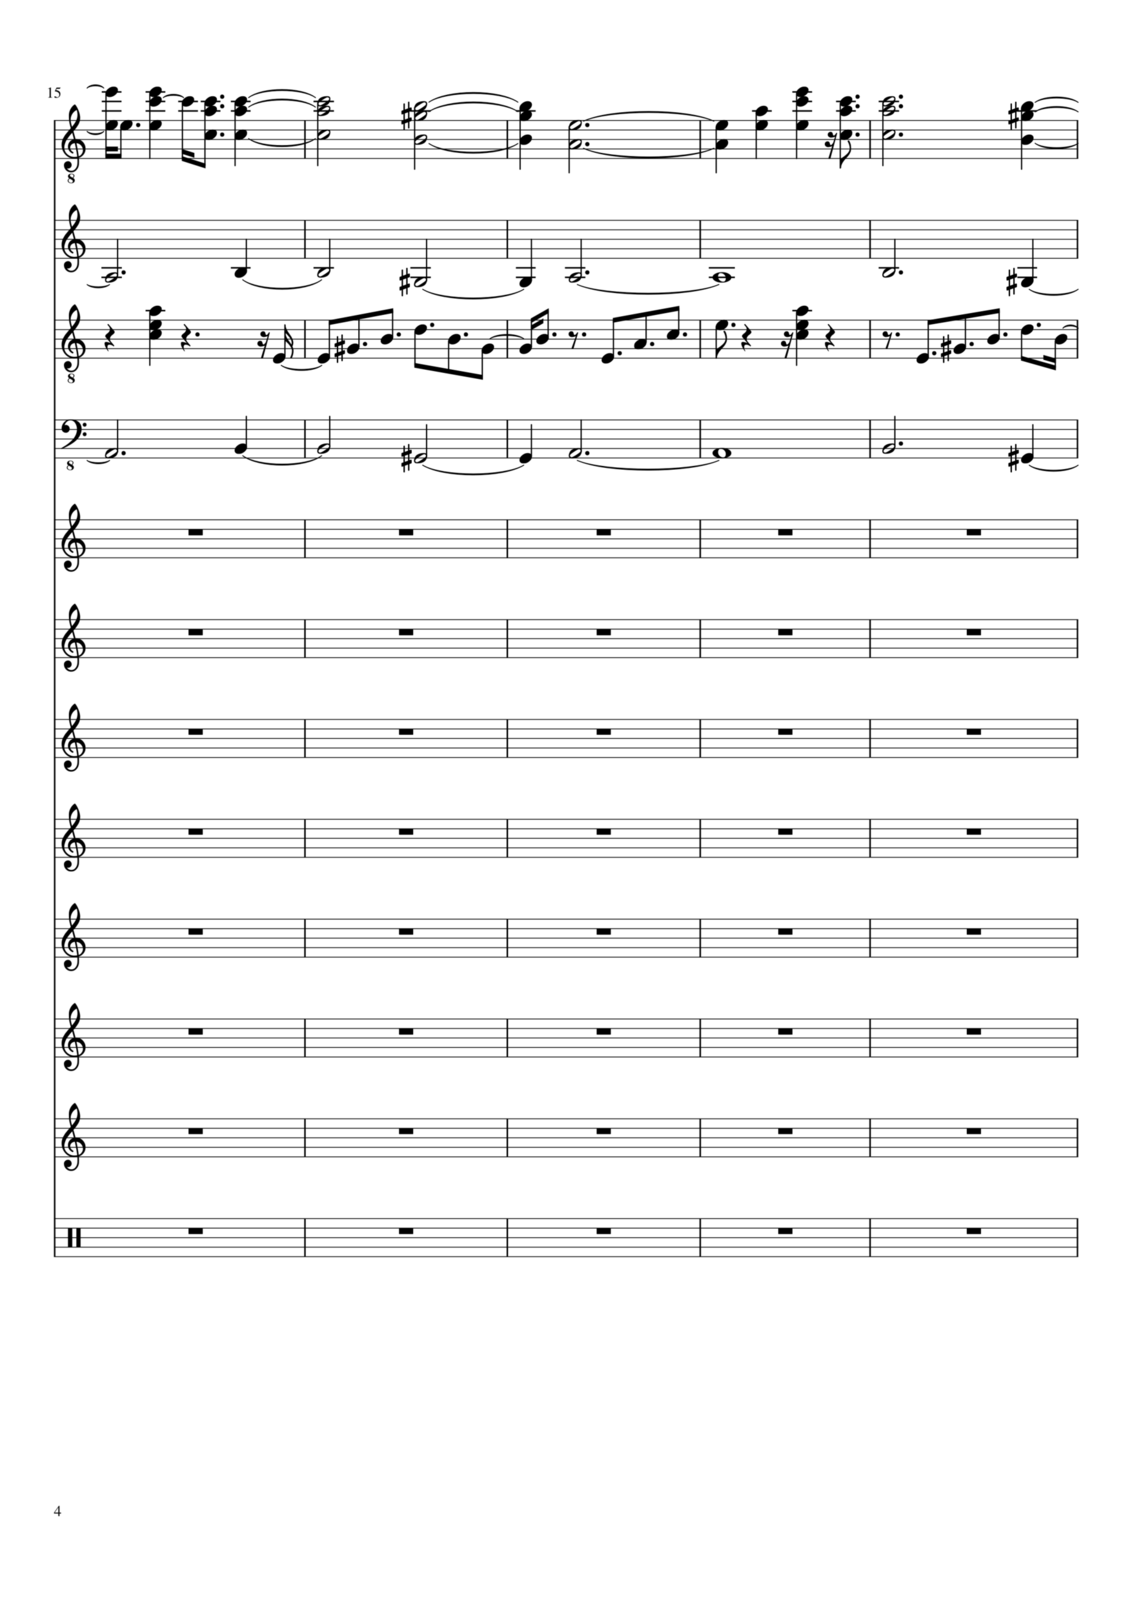 Prosti slide, Image 4